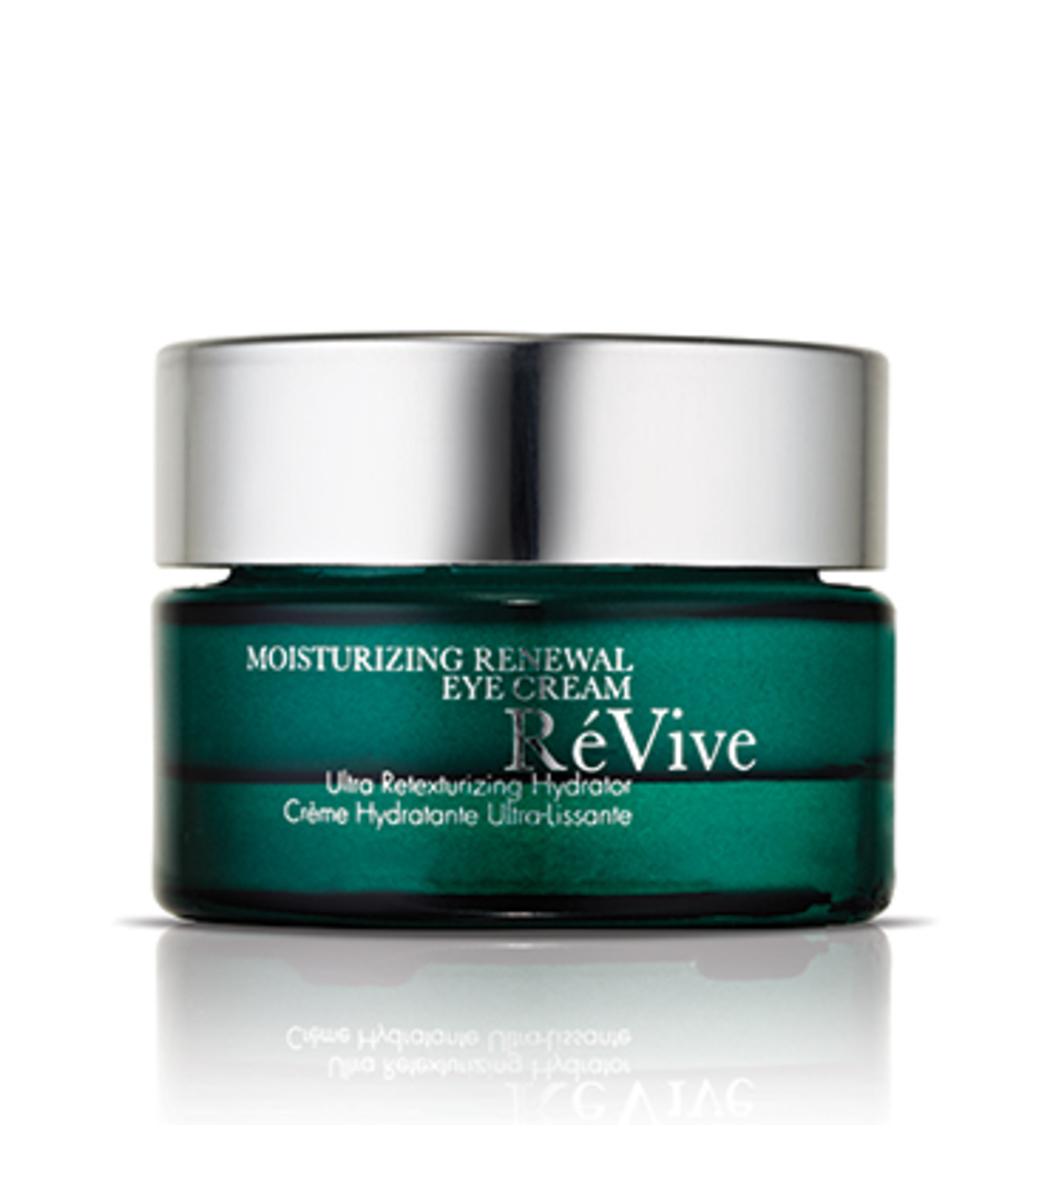 REVIVE Moisturizing Renewal Eye Cream